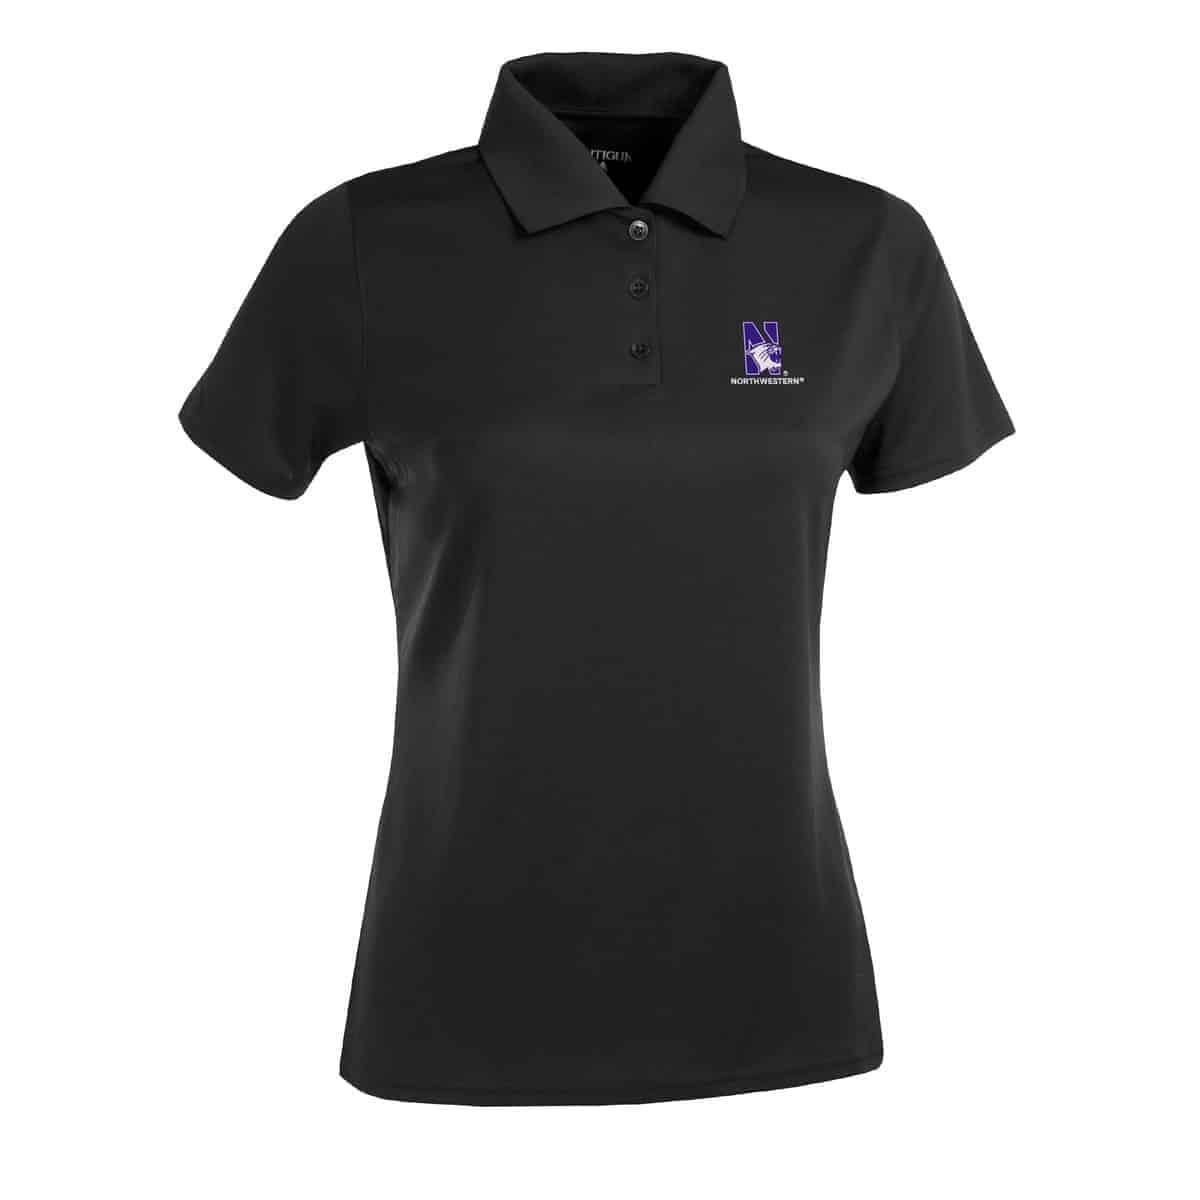 Northwestern Widcats Antigua Women s Black Polo Shirt Women s Exceed 100223 555601da38